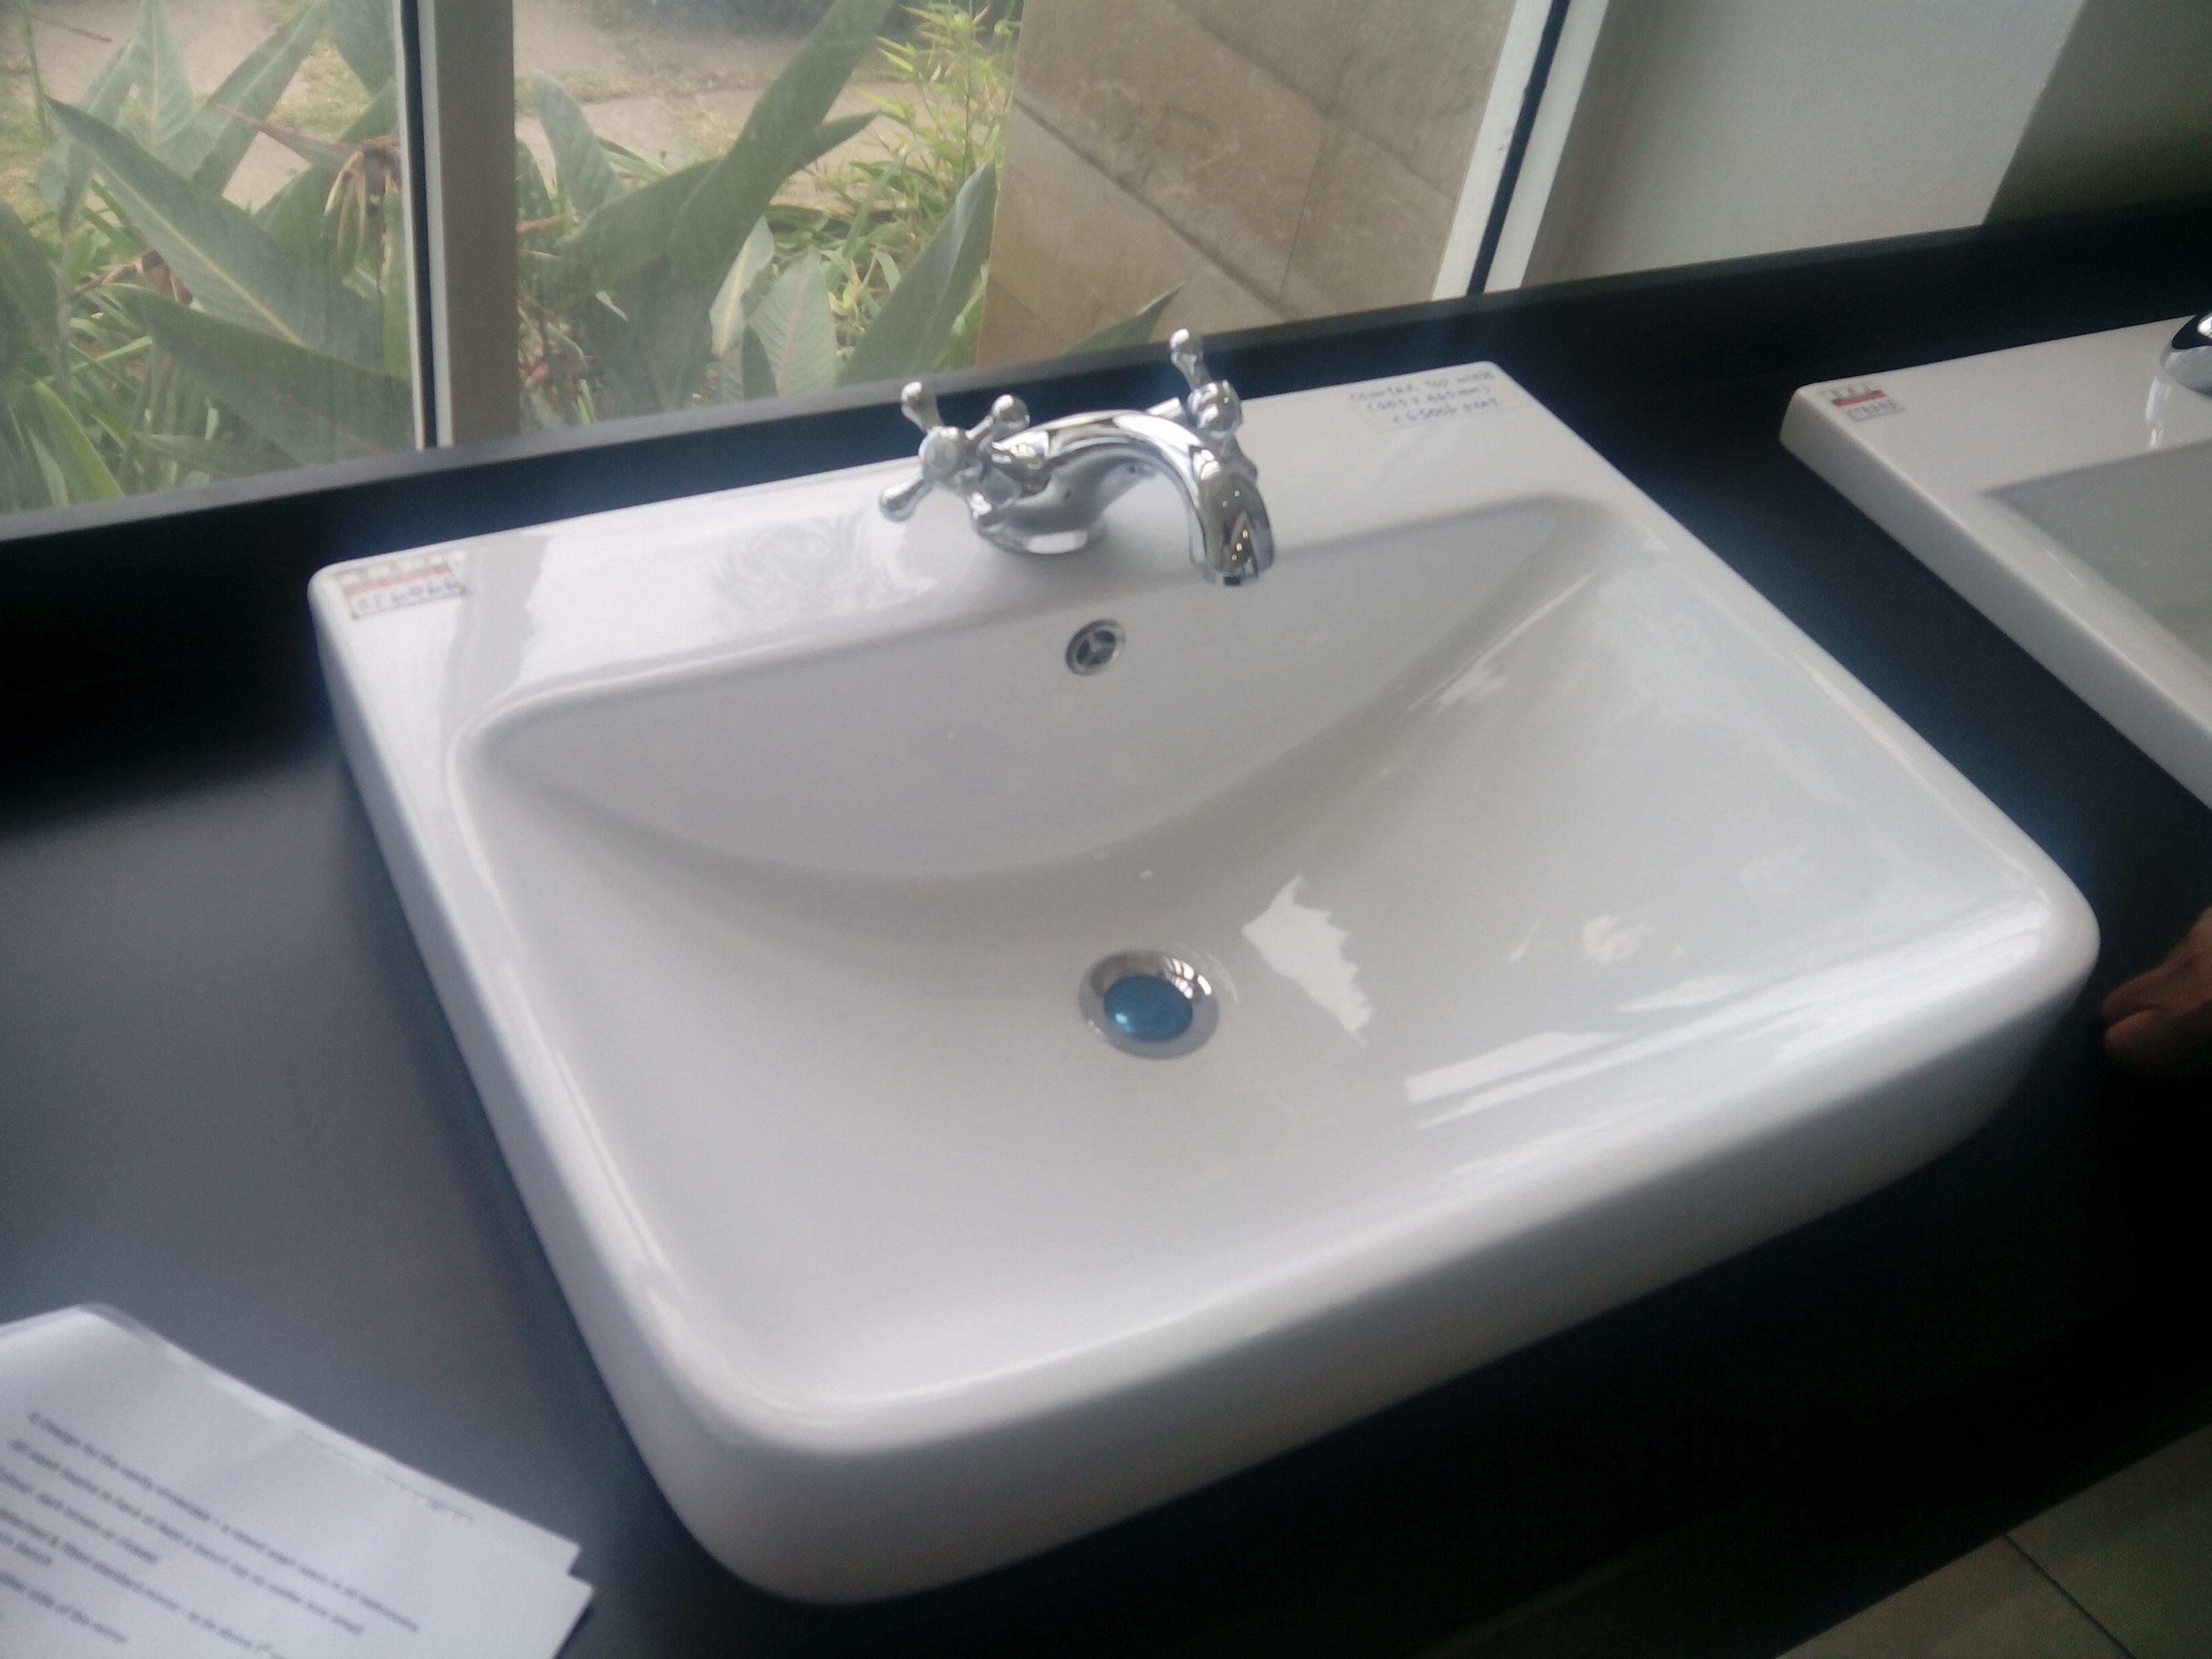 Ceramic tiles and sanitary fittings in kenya for Bathroom decor nairobi